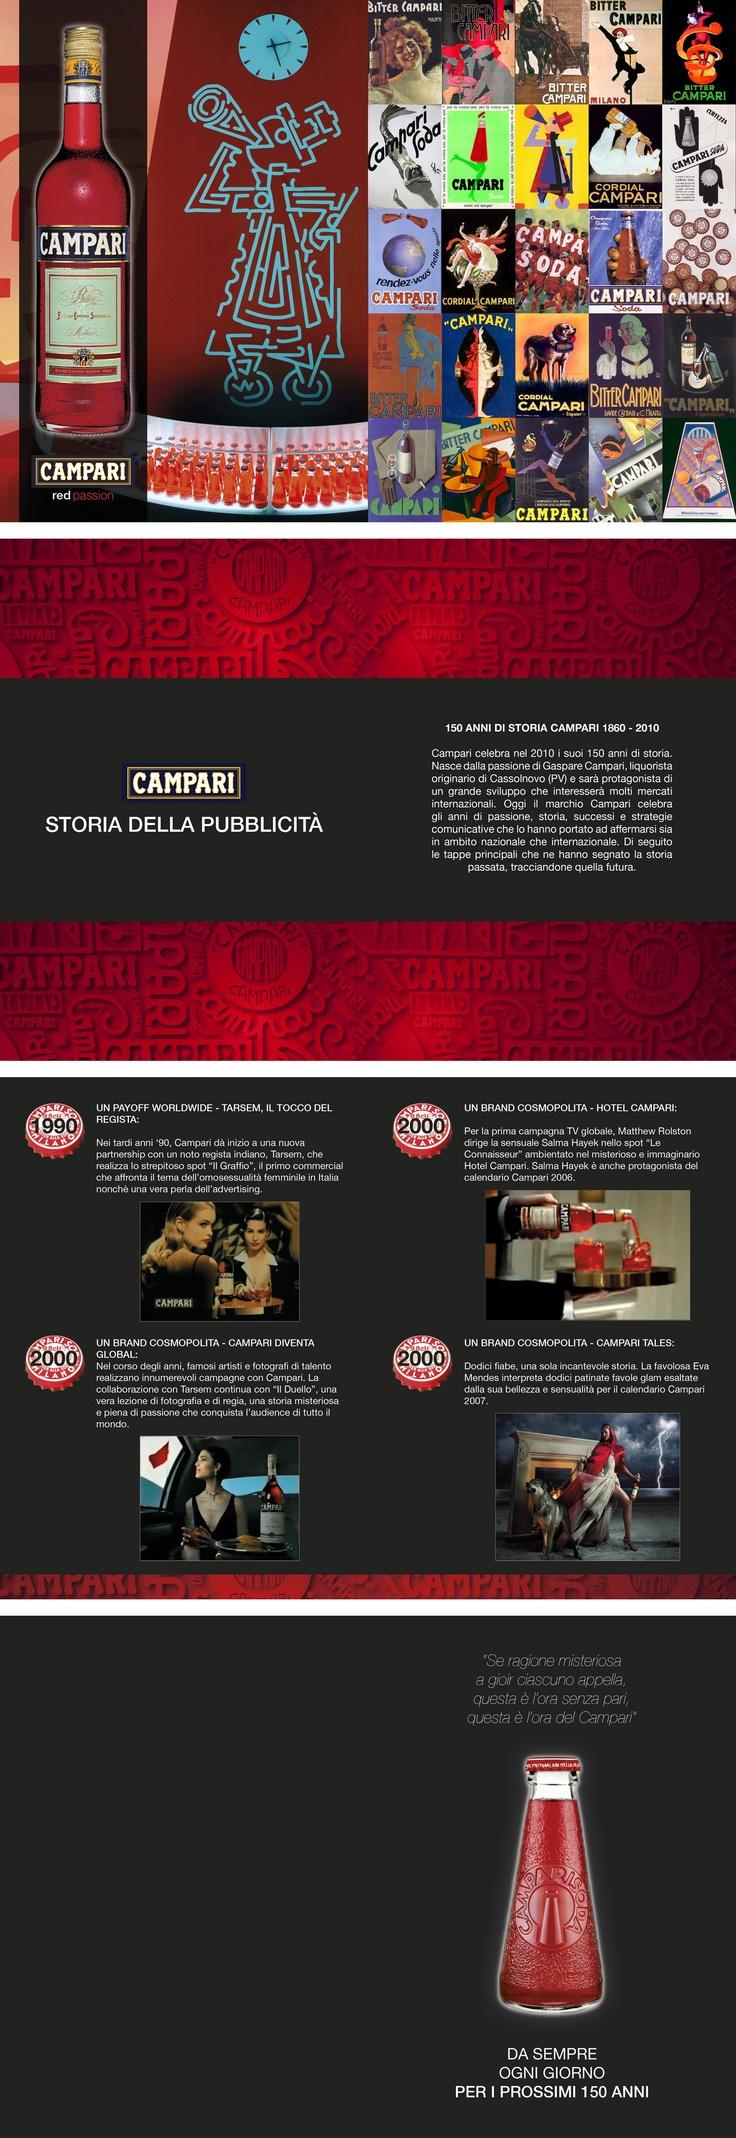 #campari #storiadellapubblicità #brochure #istitutodesignpalladio #giuliaguerra